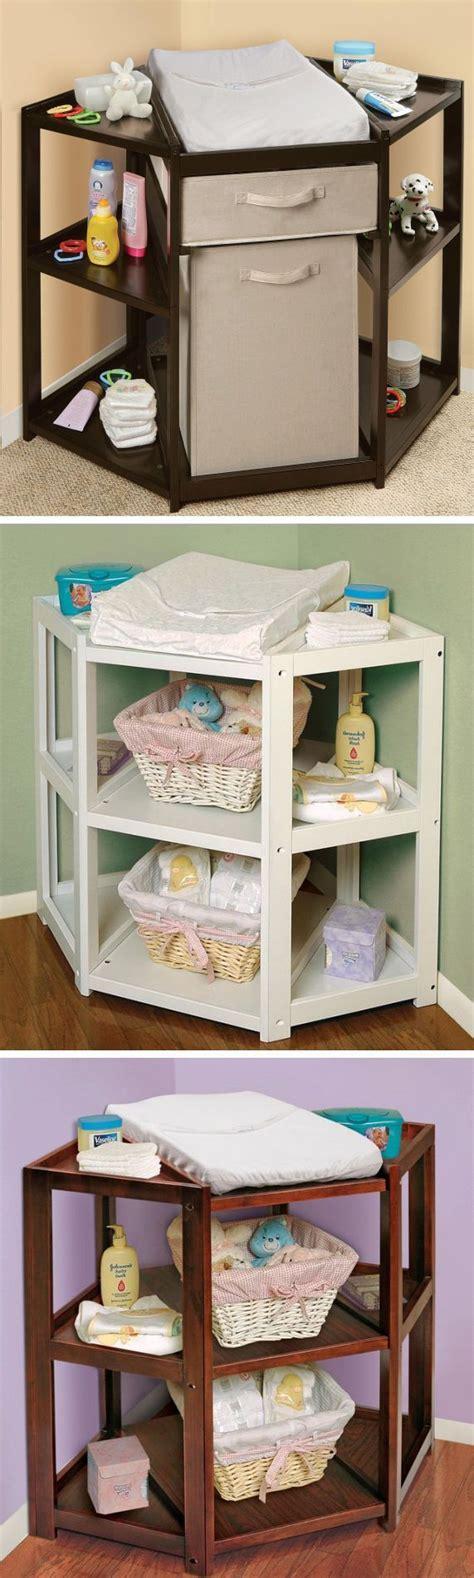 changing table organization ideas 151 best nursery organization ideas organizing tips and